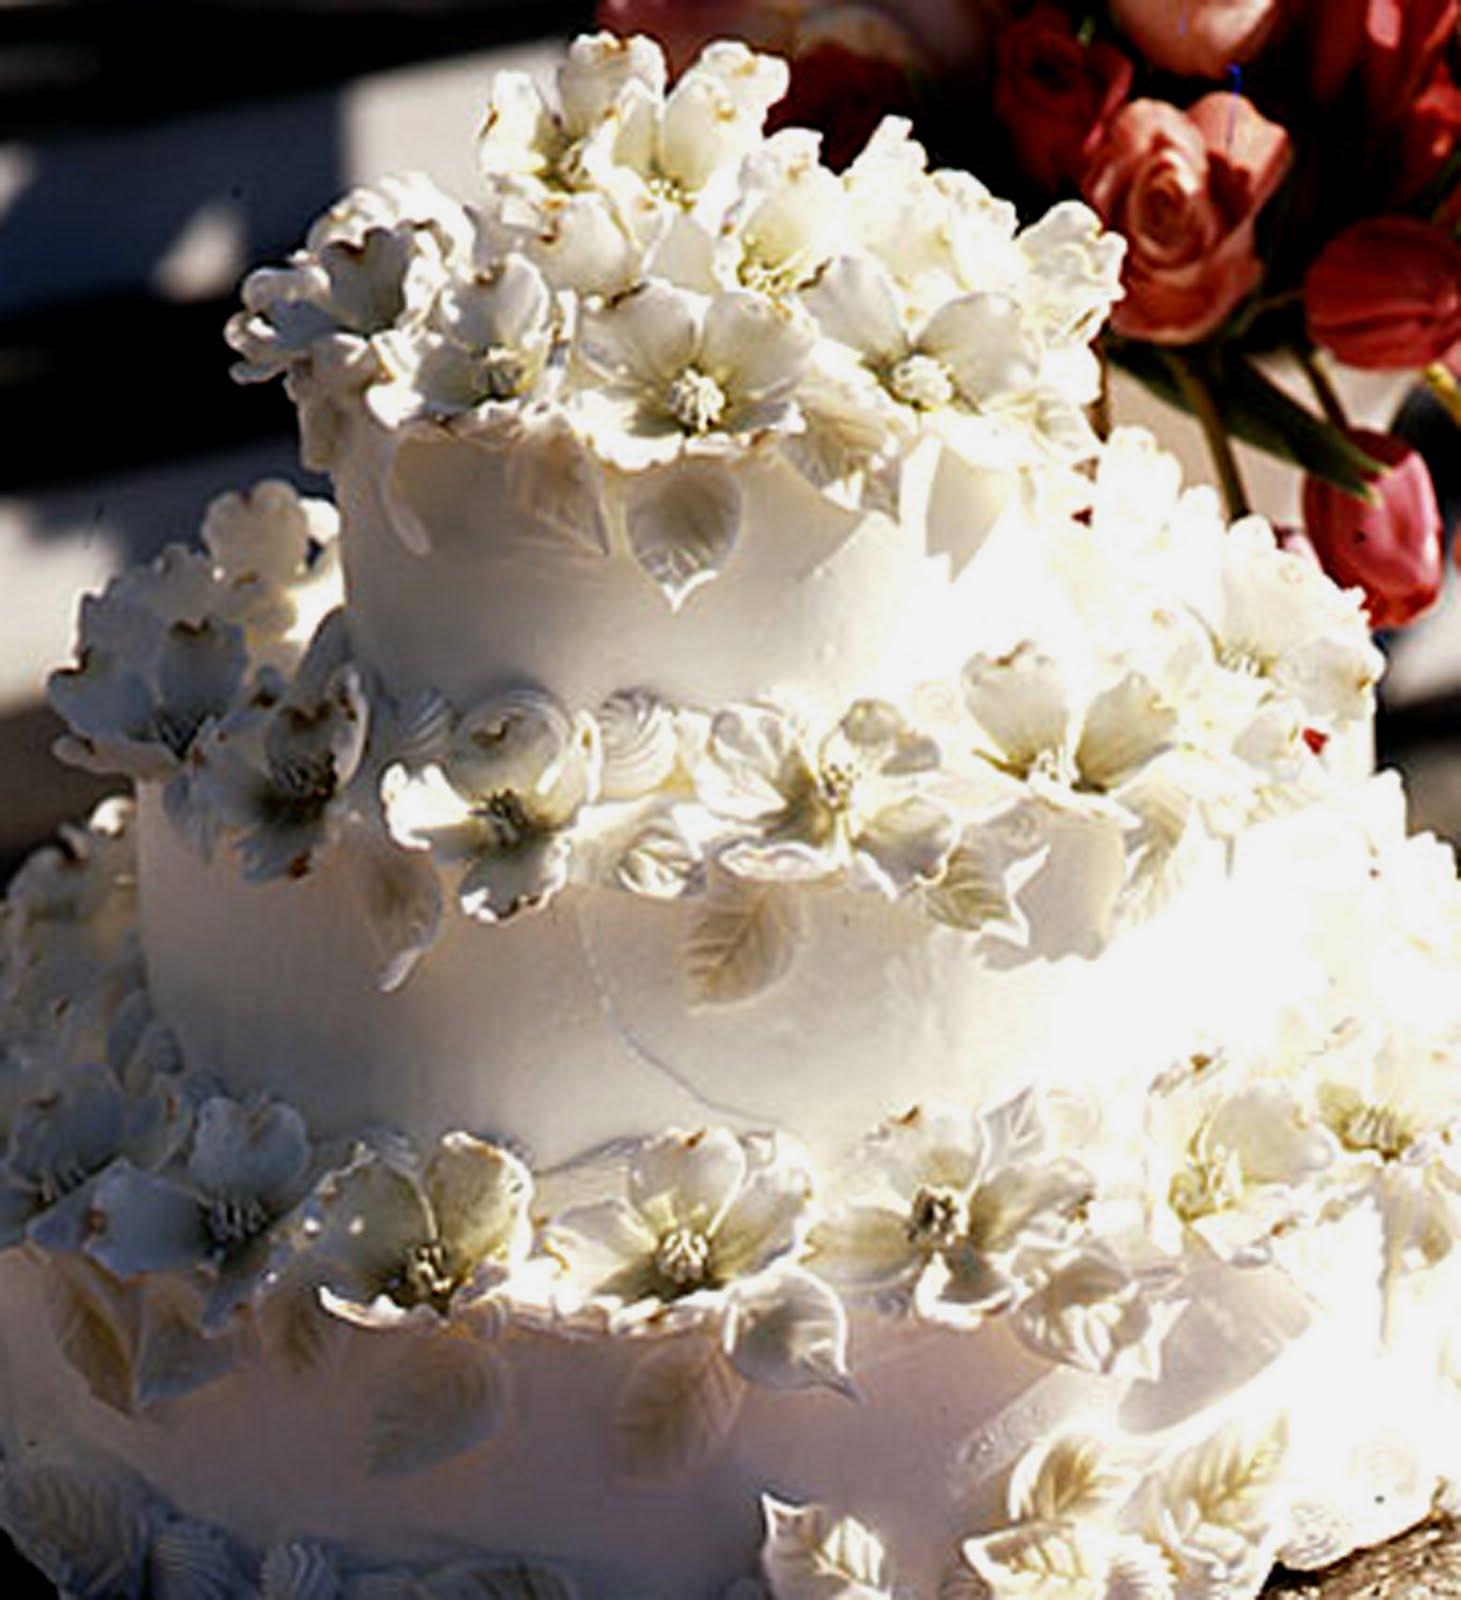 Wedding Cake Tree Dogwood: Flora wonder the variegated c section ...